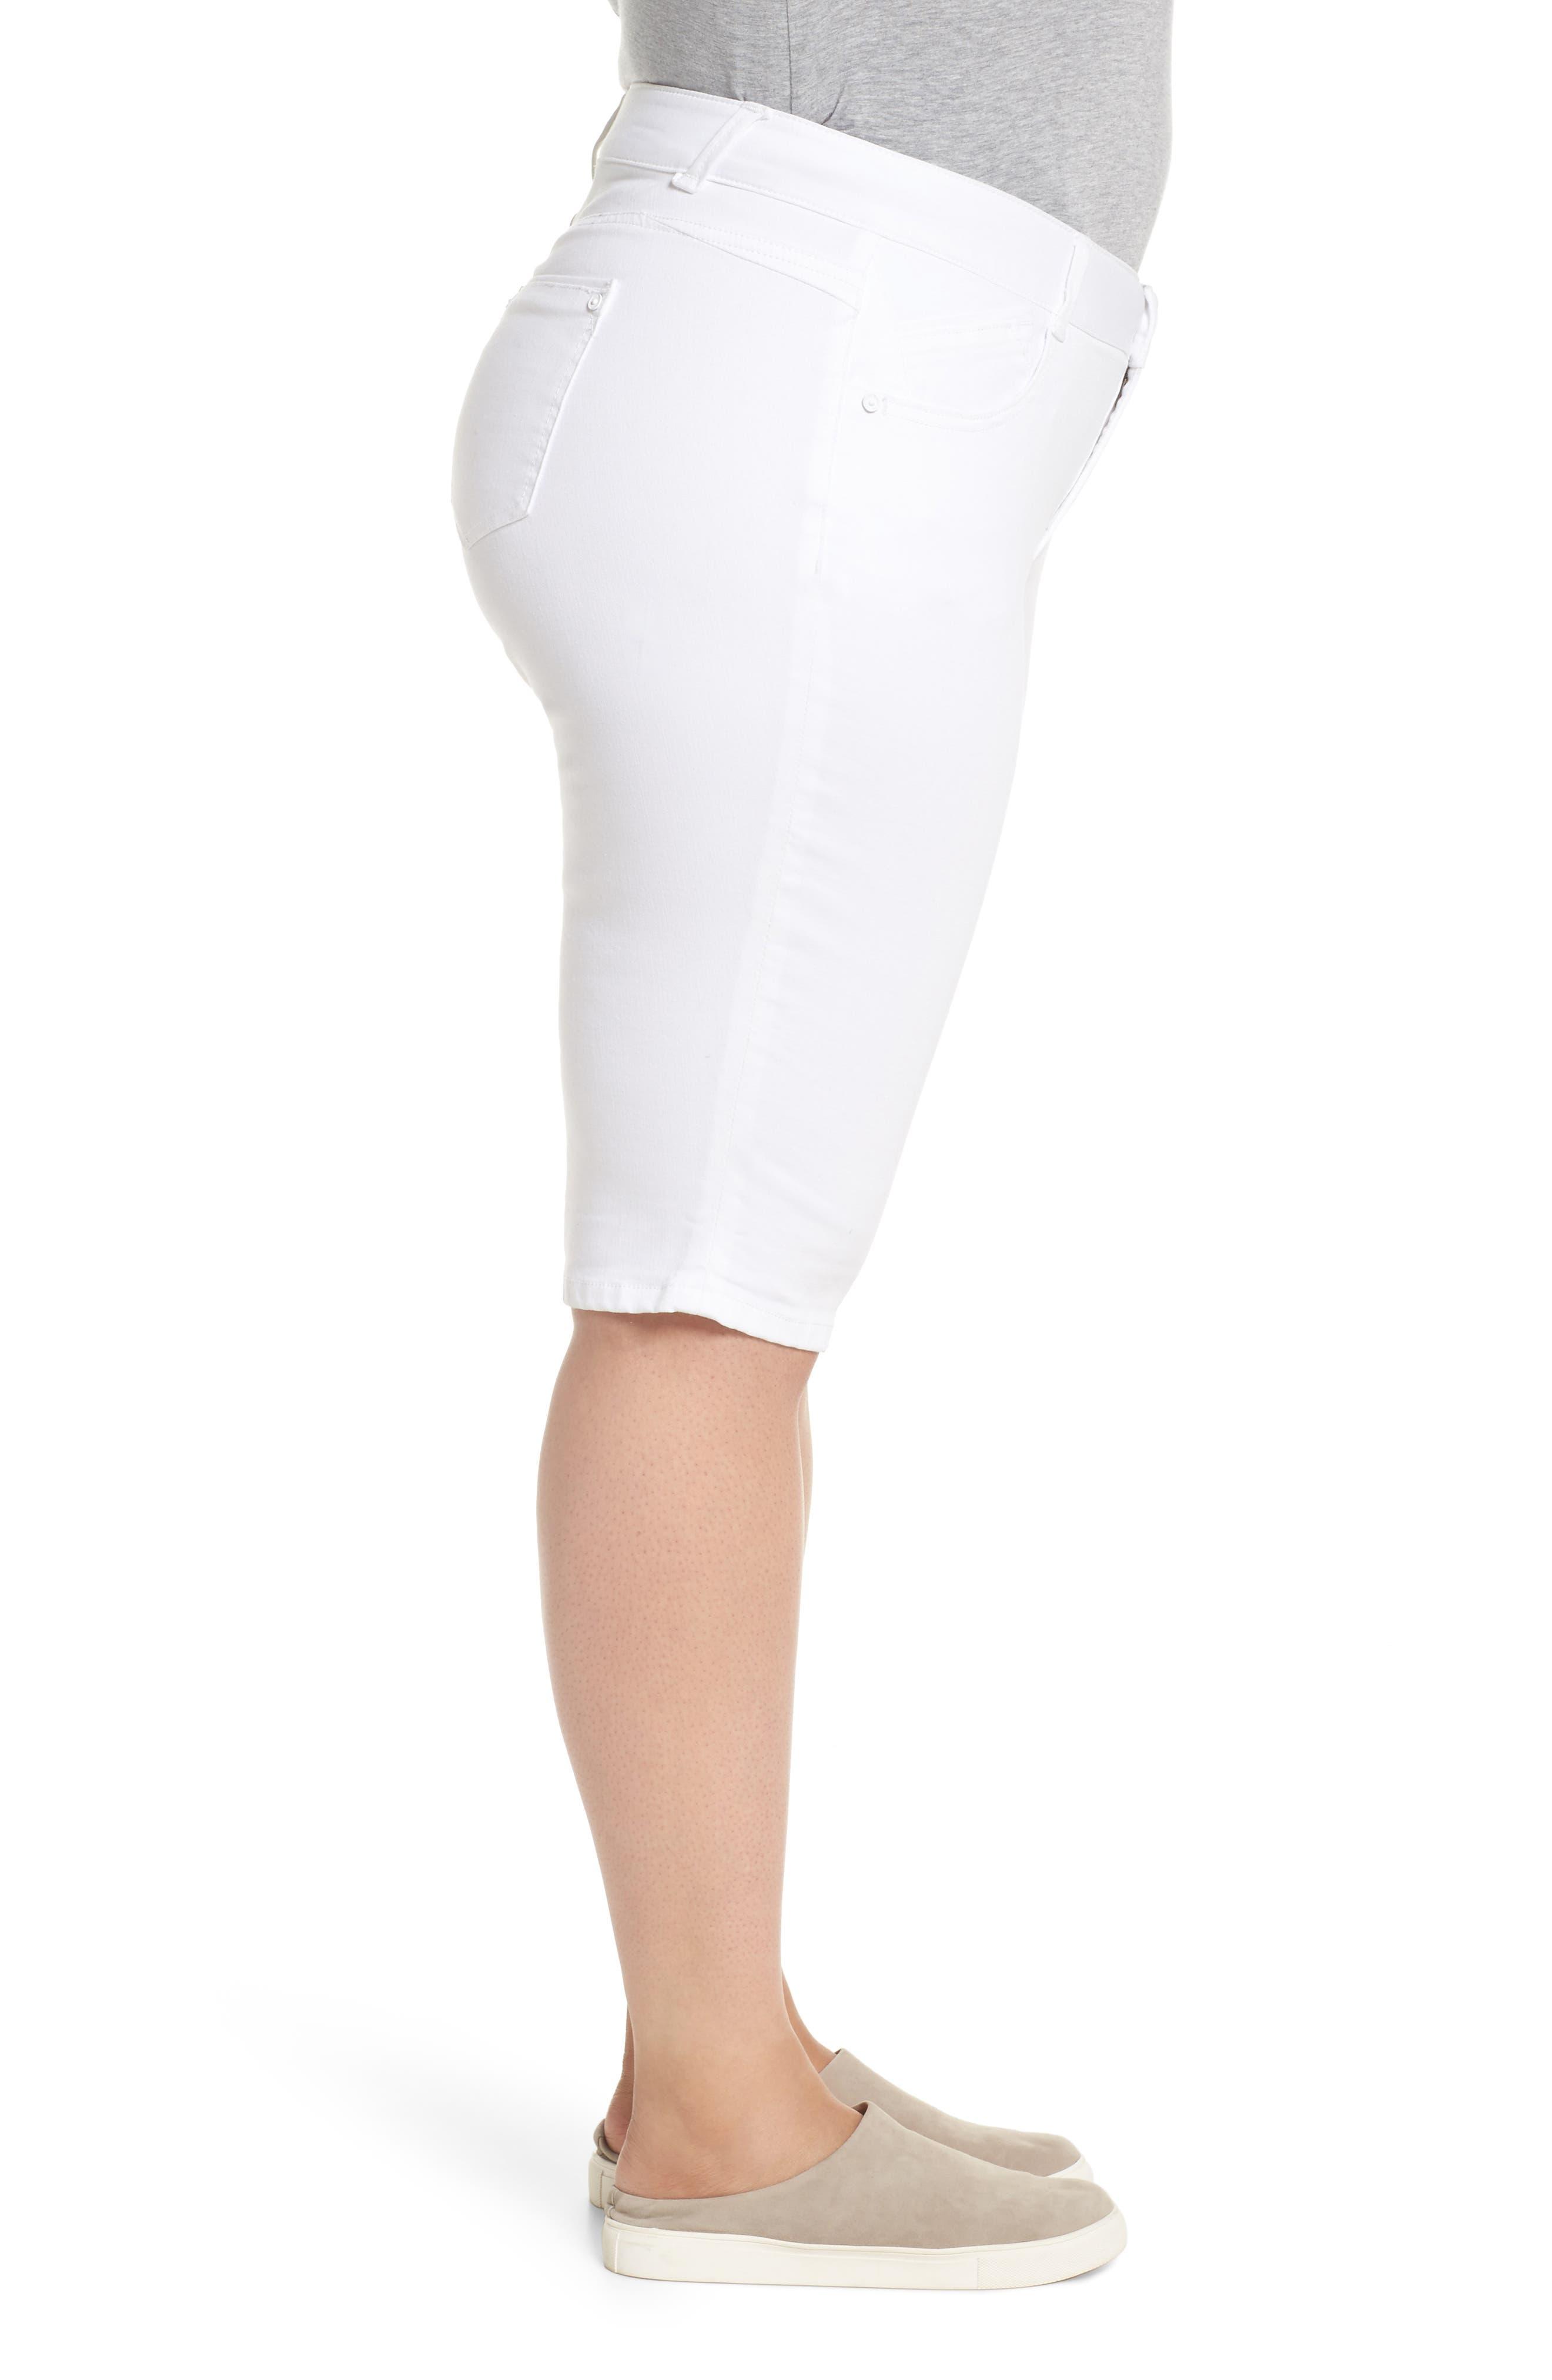 Ab-solution Bermuda Shorts,                             Alternate thumbnail 3, color,                             Optic White